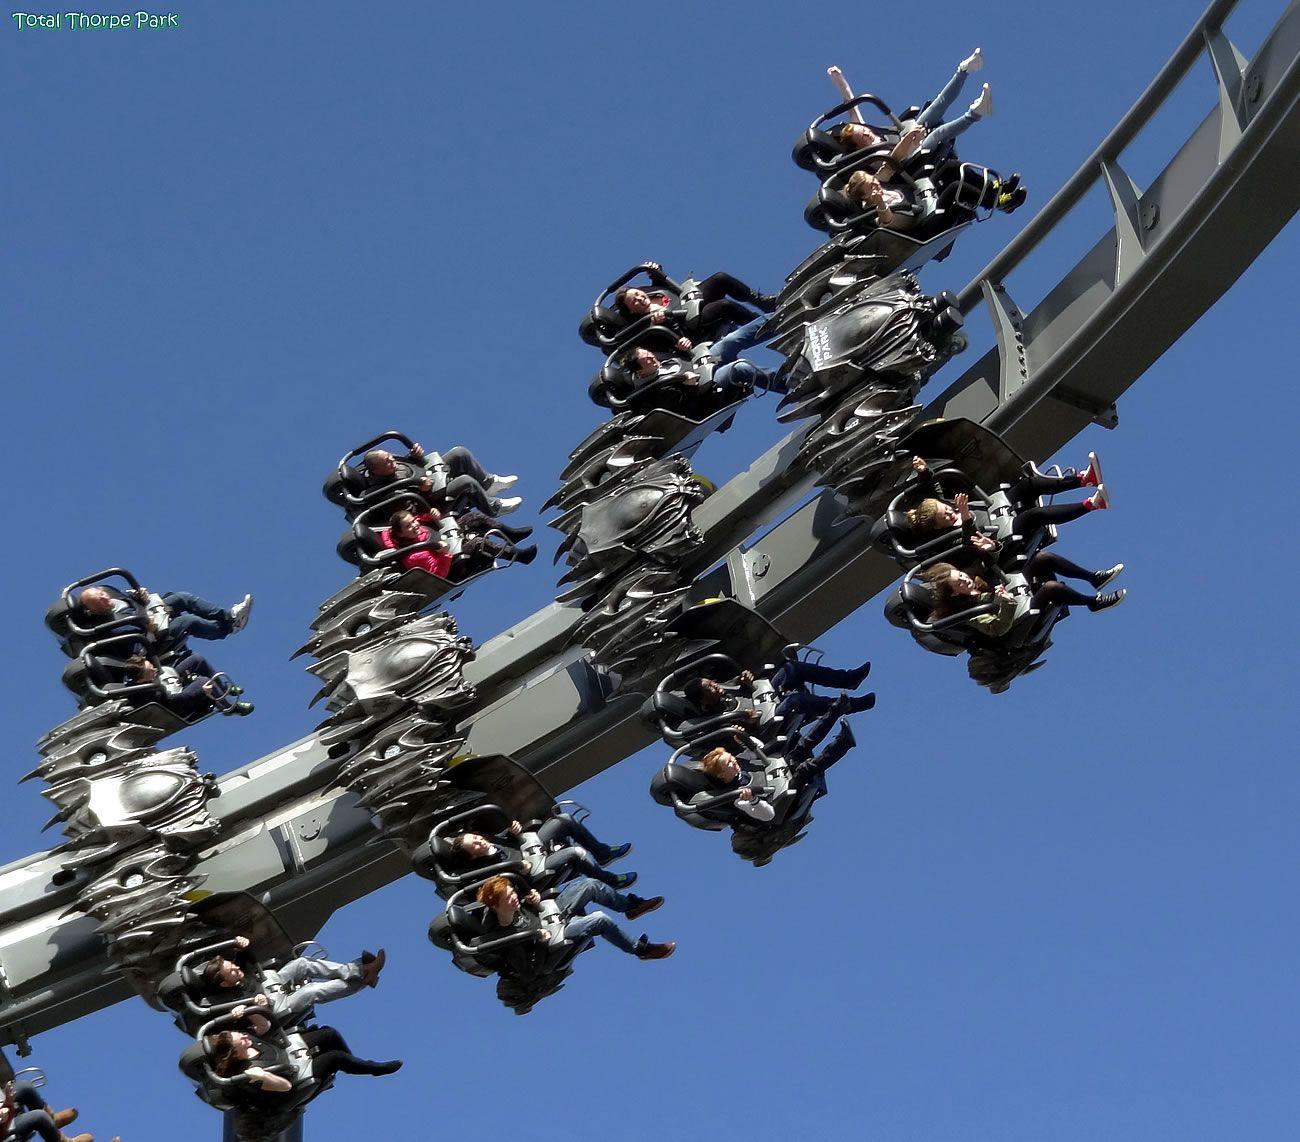 THORPE PARK: Brave the Swarm ride at Thorpe Park. http://www.thorpepark.com/rides/the-swarm.aspx